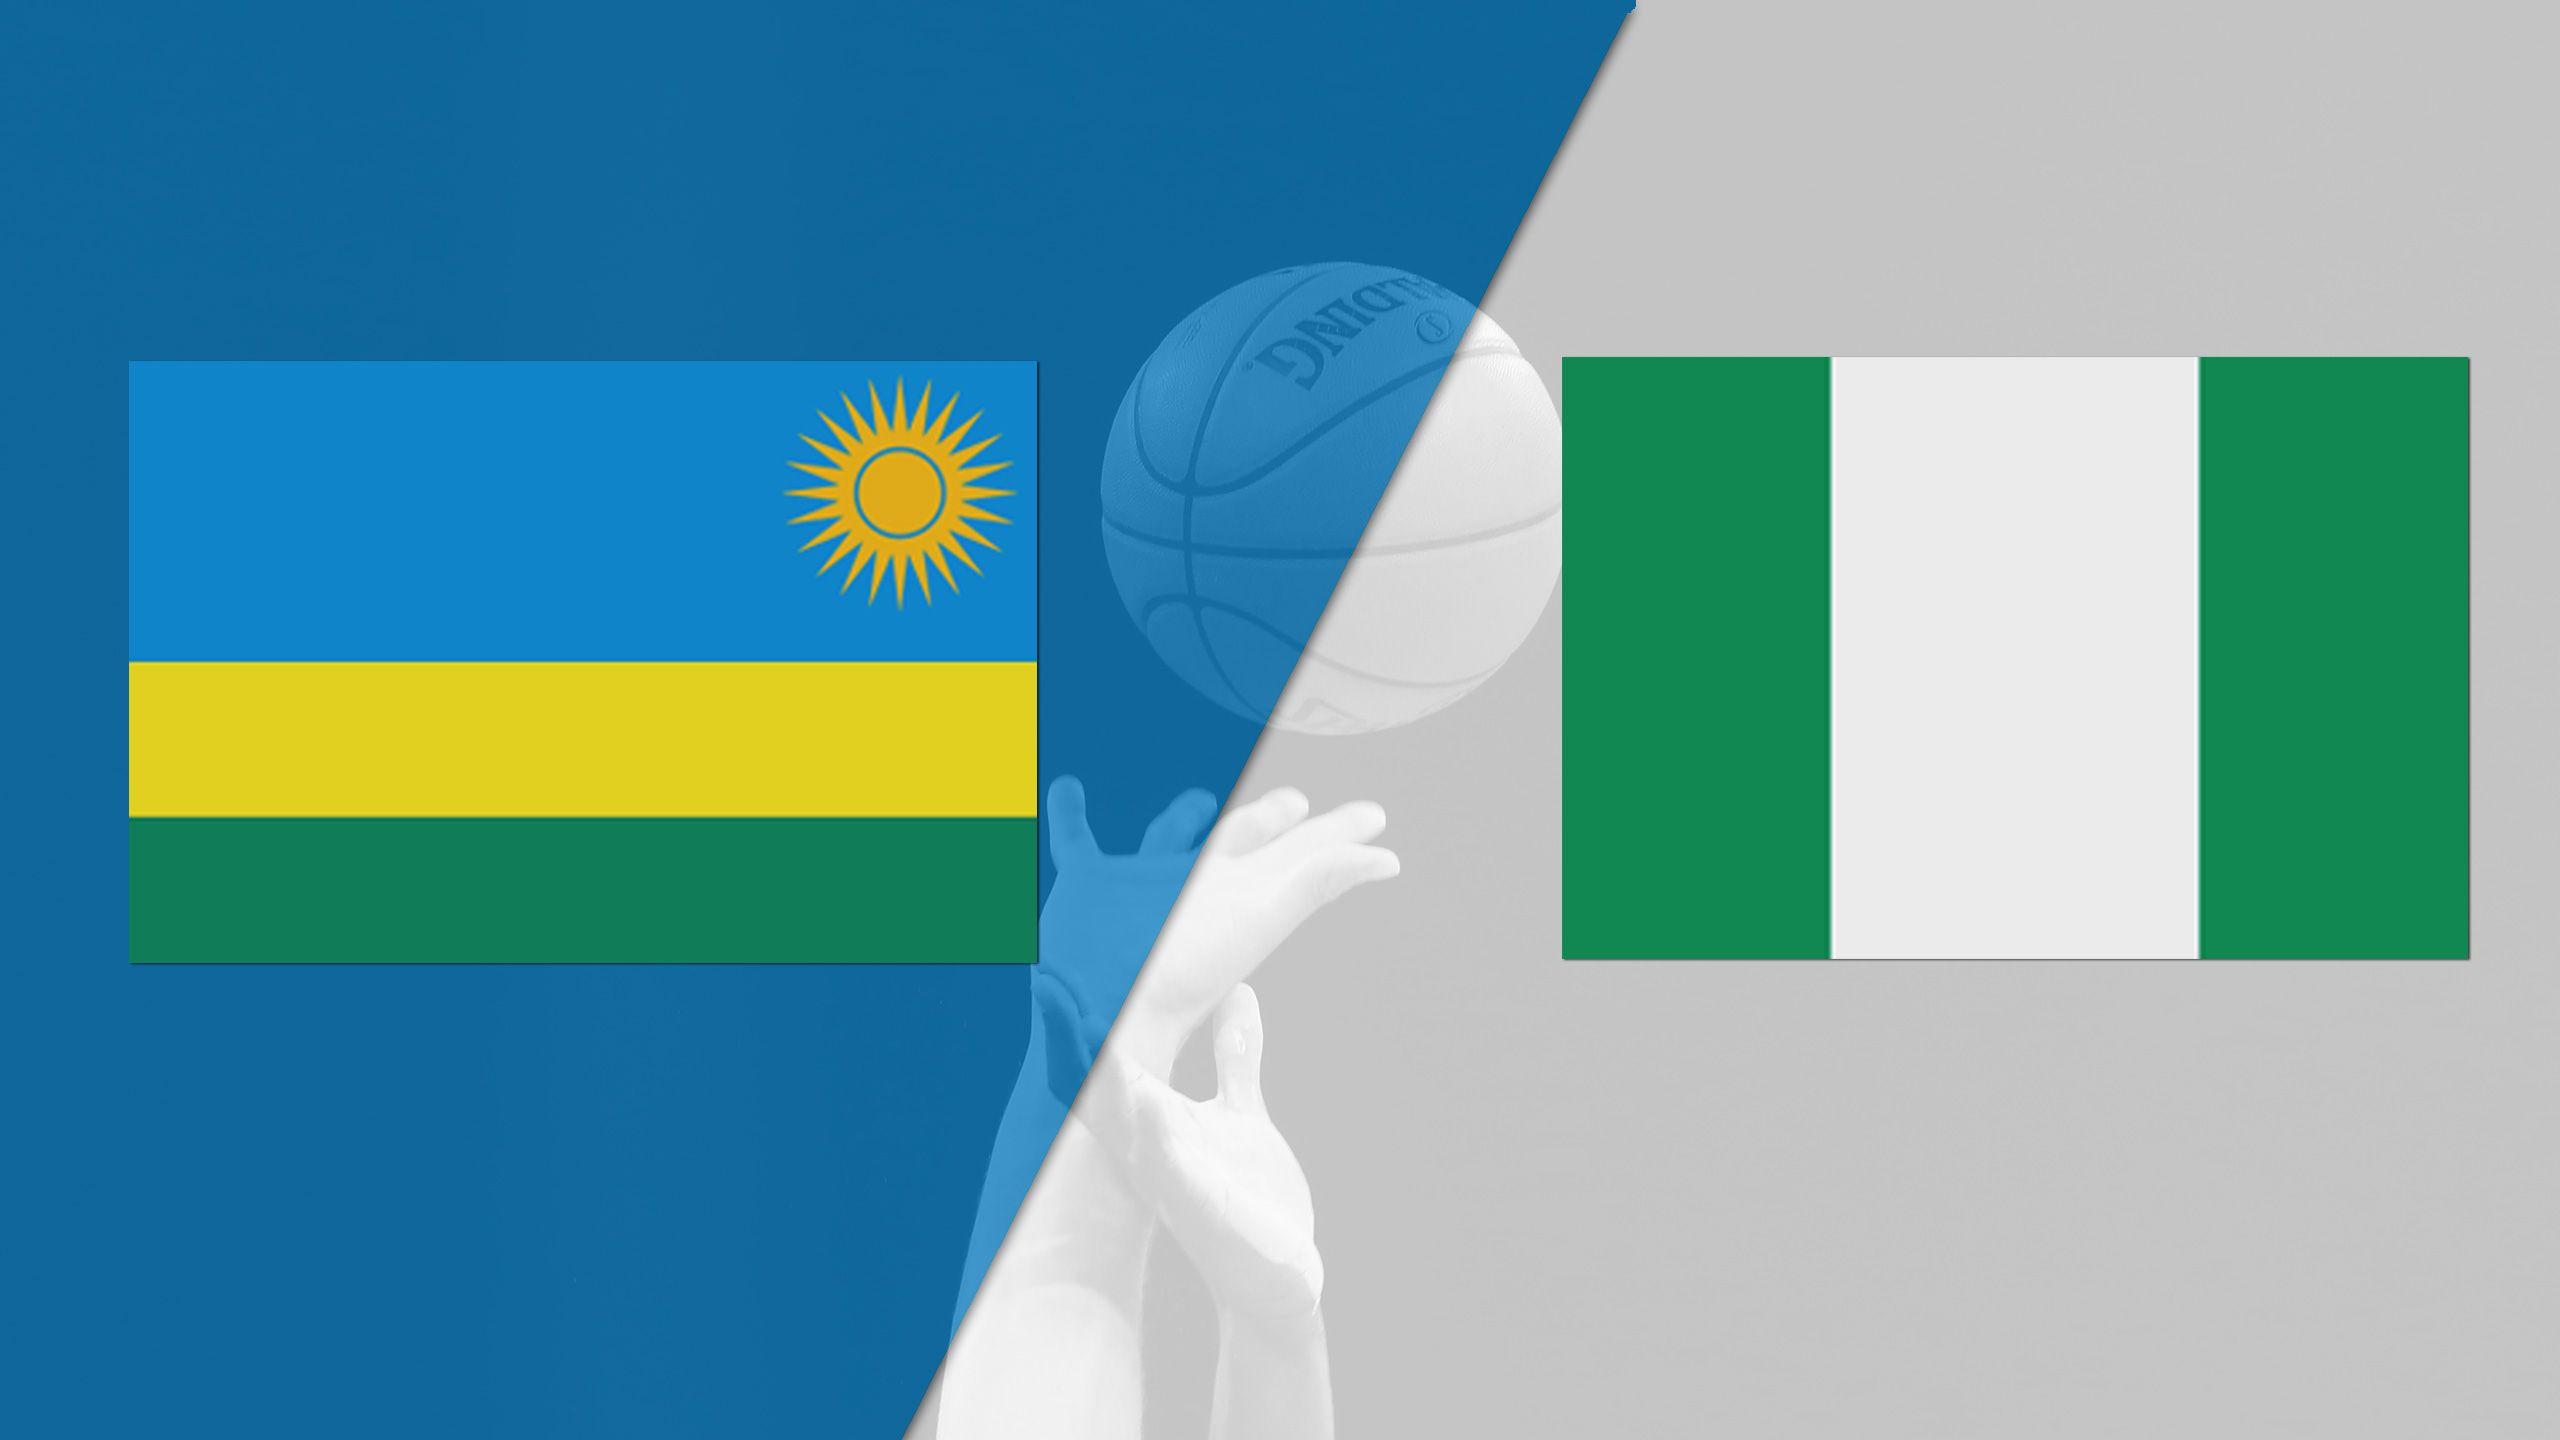 Rwanda vs. Nigeria (FIBA World Cup 2019 Qualifier)